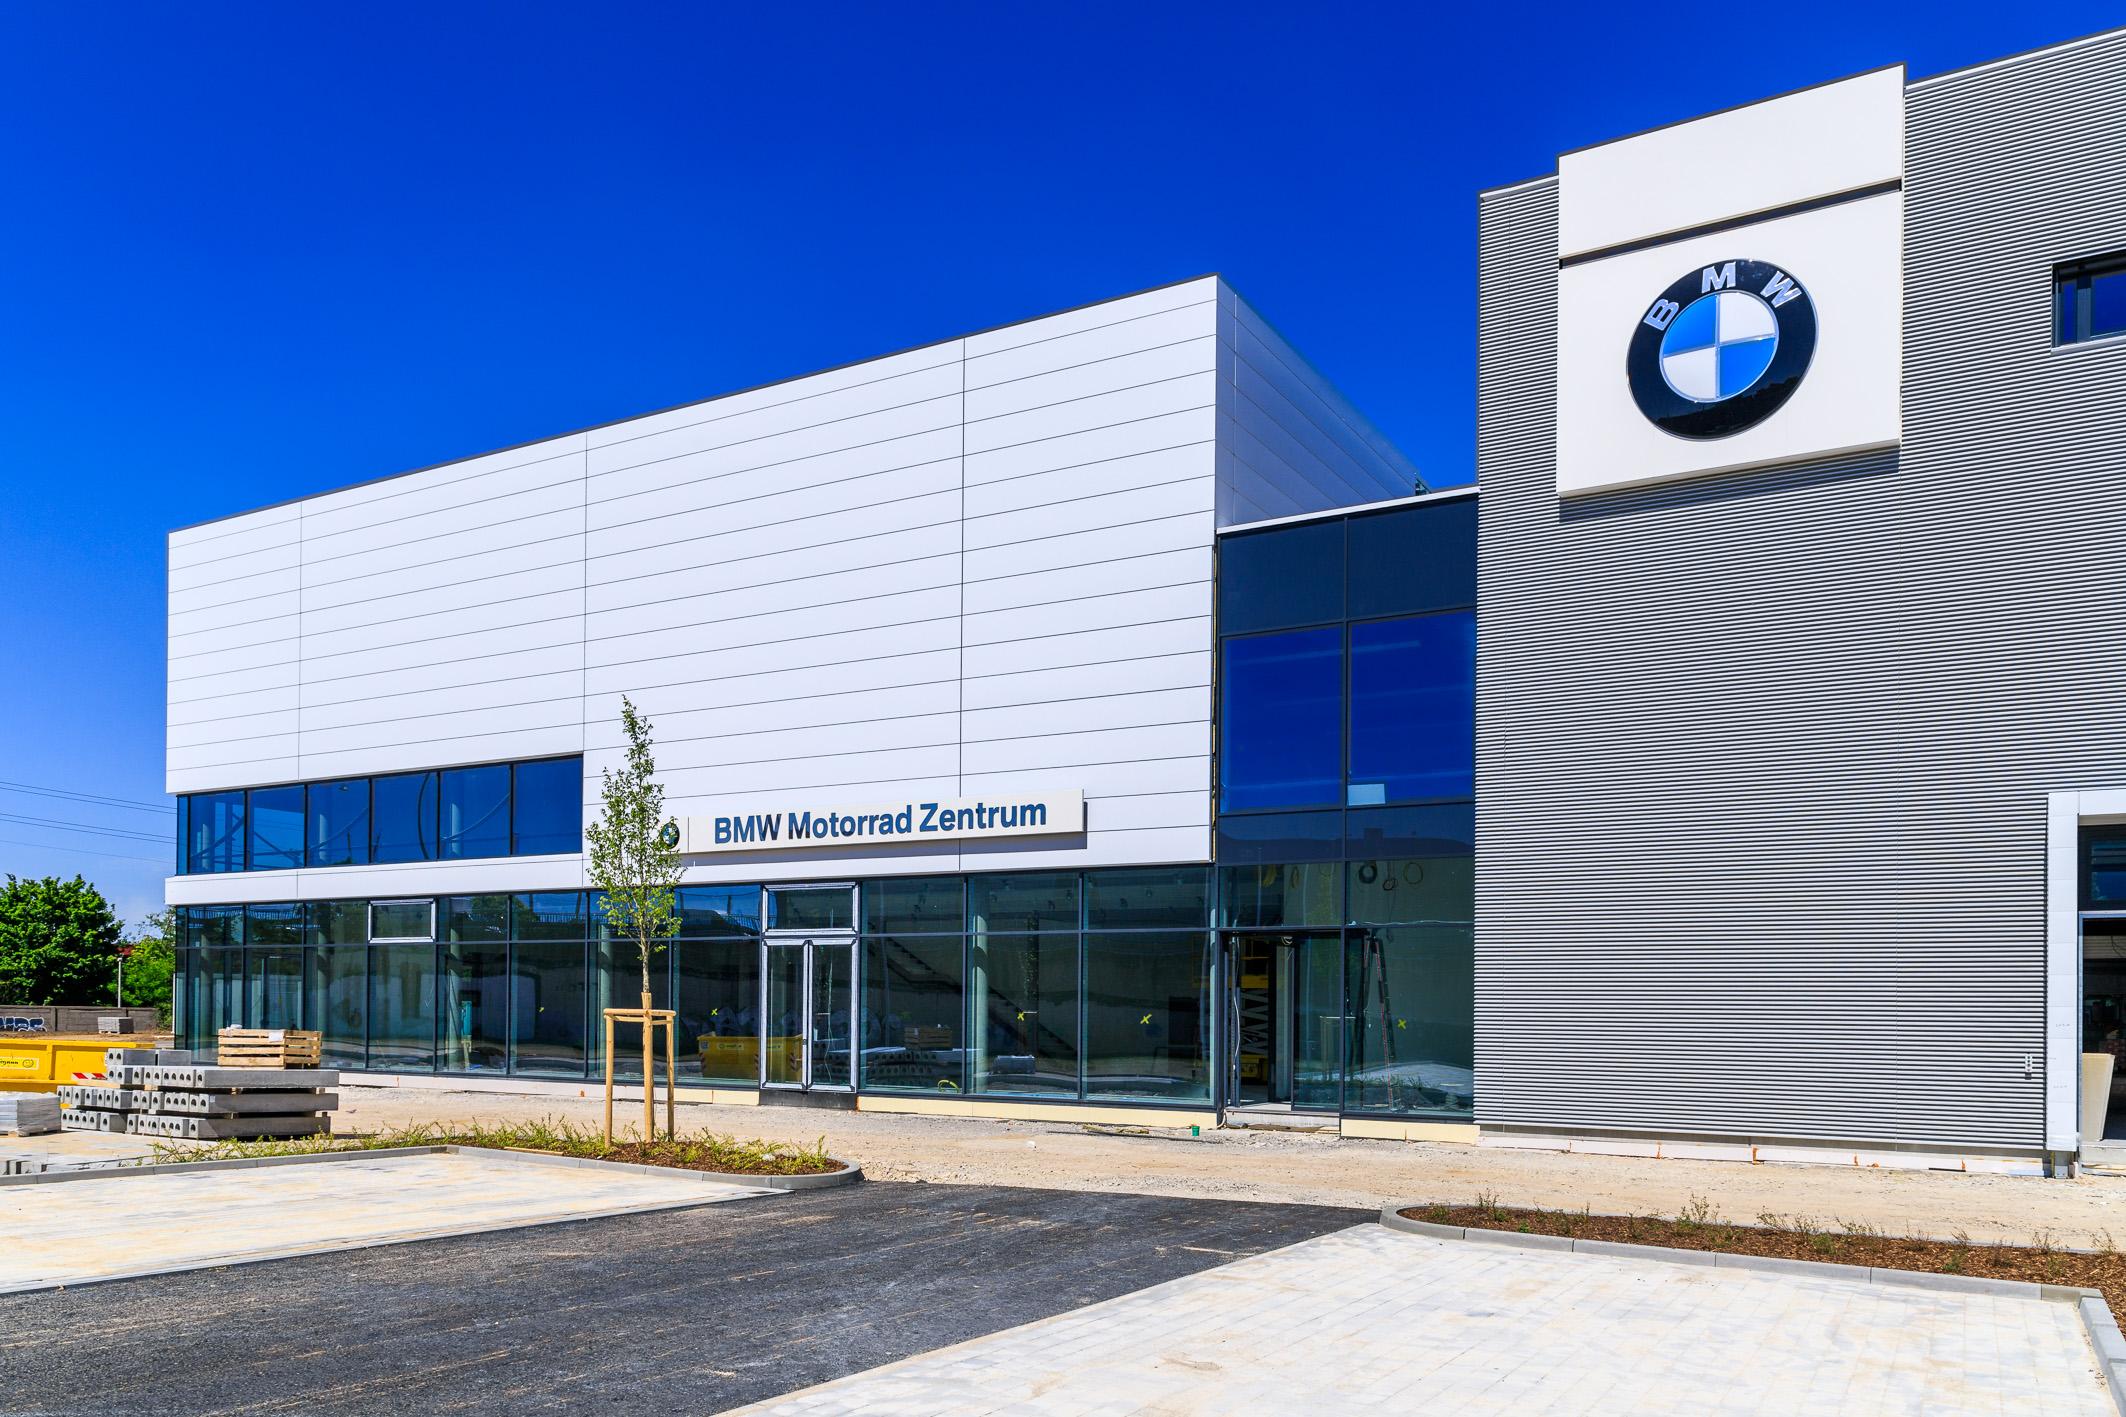 pvb_BMW_NL_2021_06_02_Boden_090